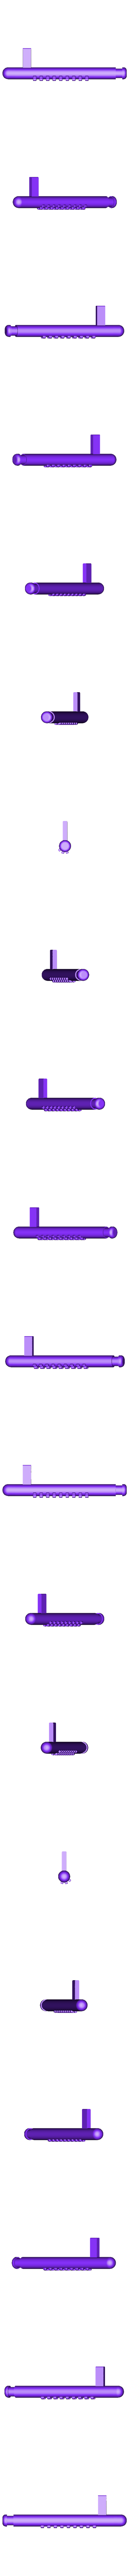 STEAM-ONLY-LEFT.stl Download free STL file Latch Cryptex - Cerrojo • 3D printable design, xutano